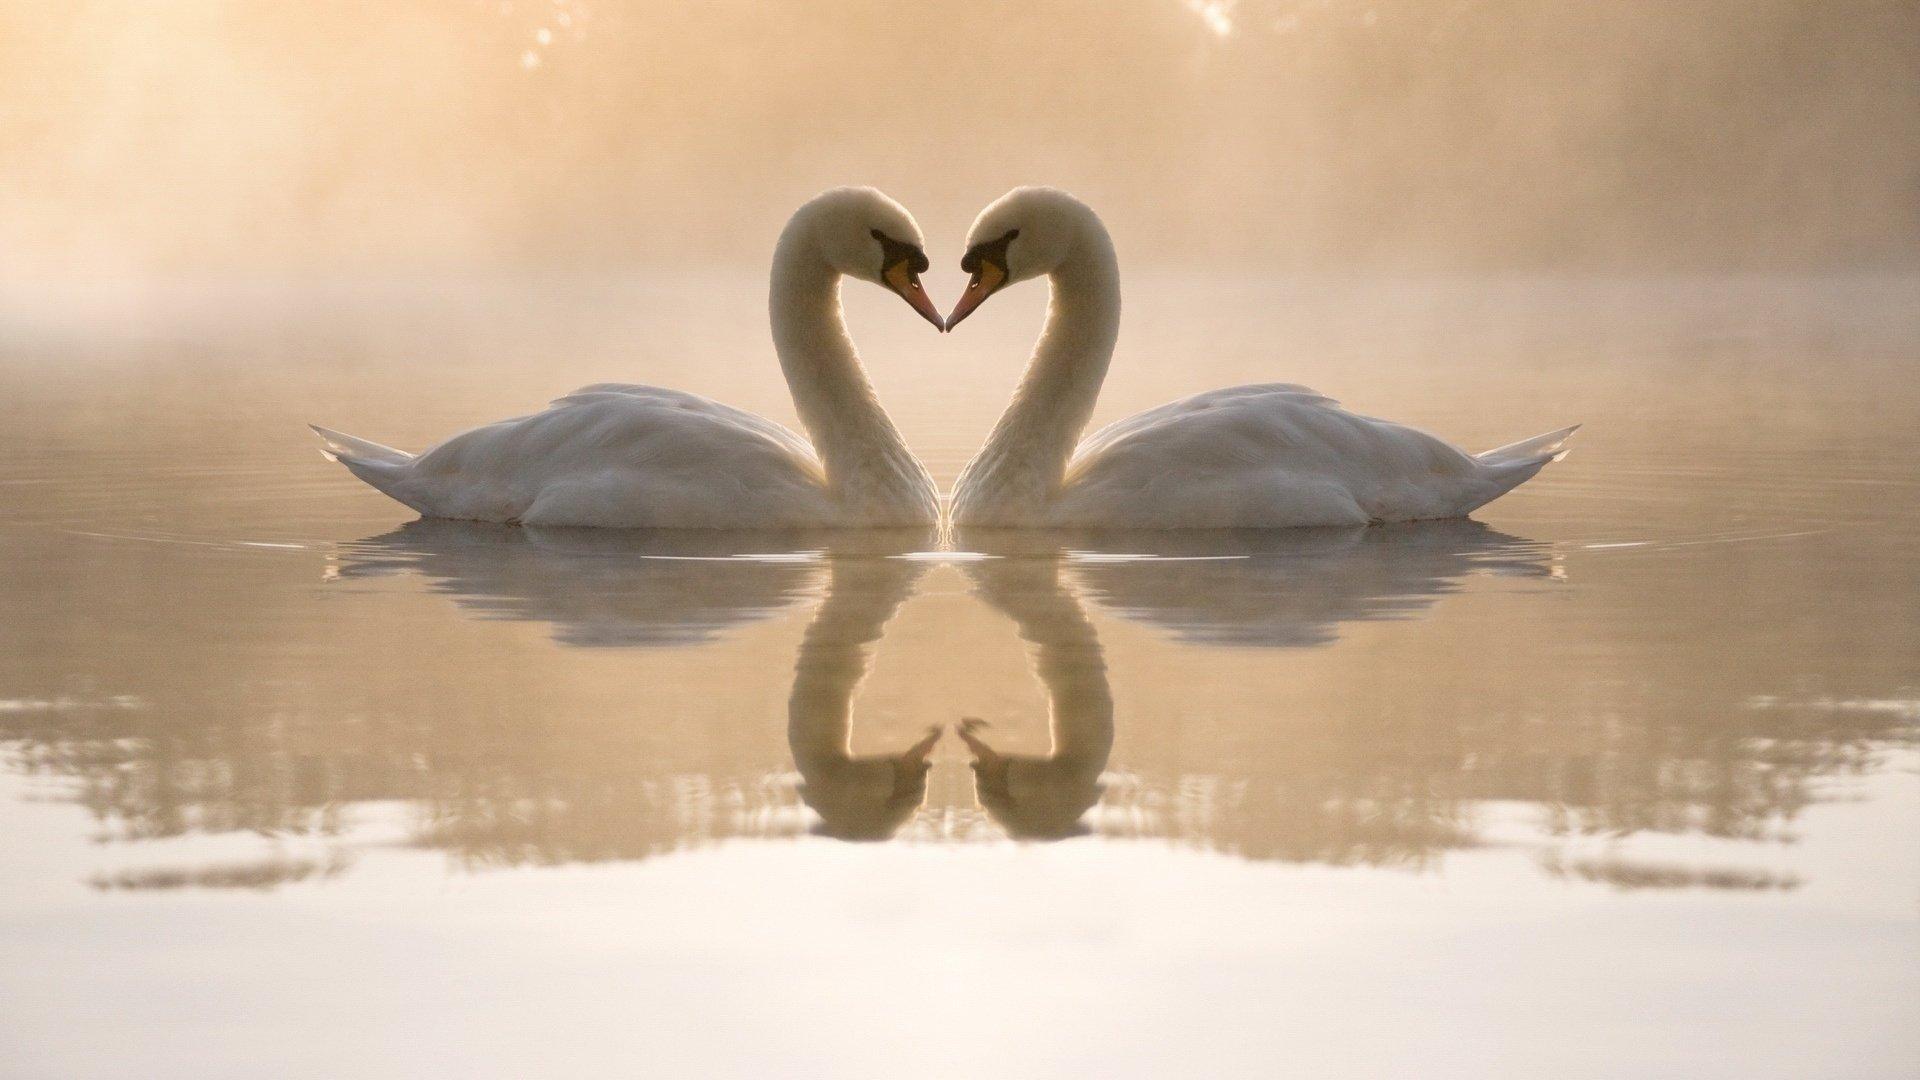 Romantic Love Wallpaper Pic